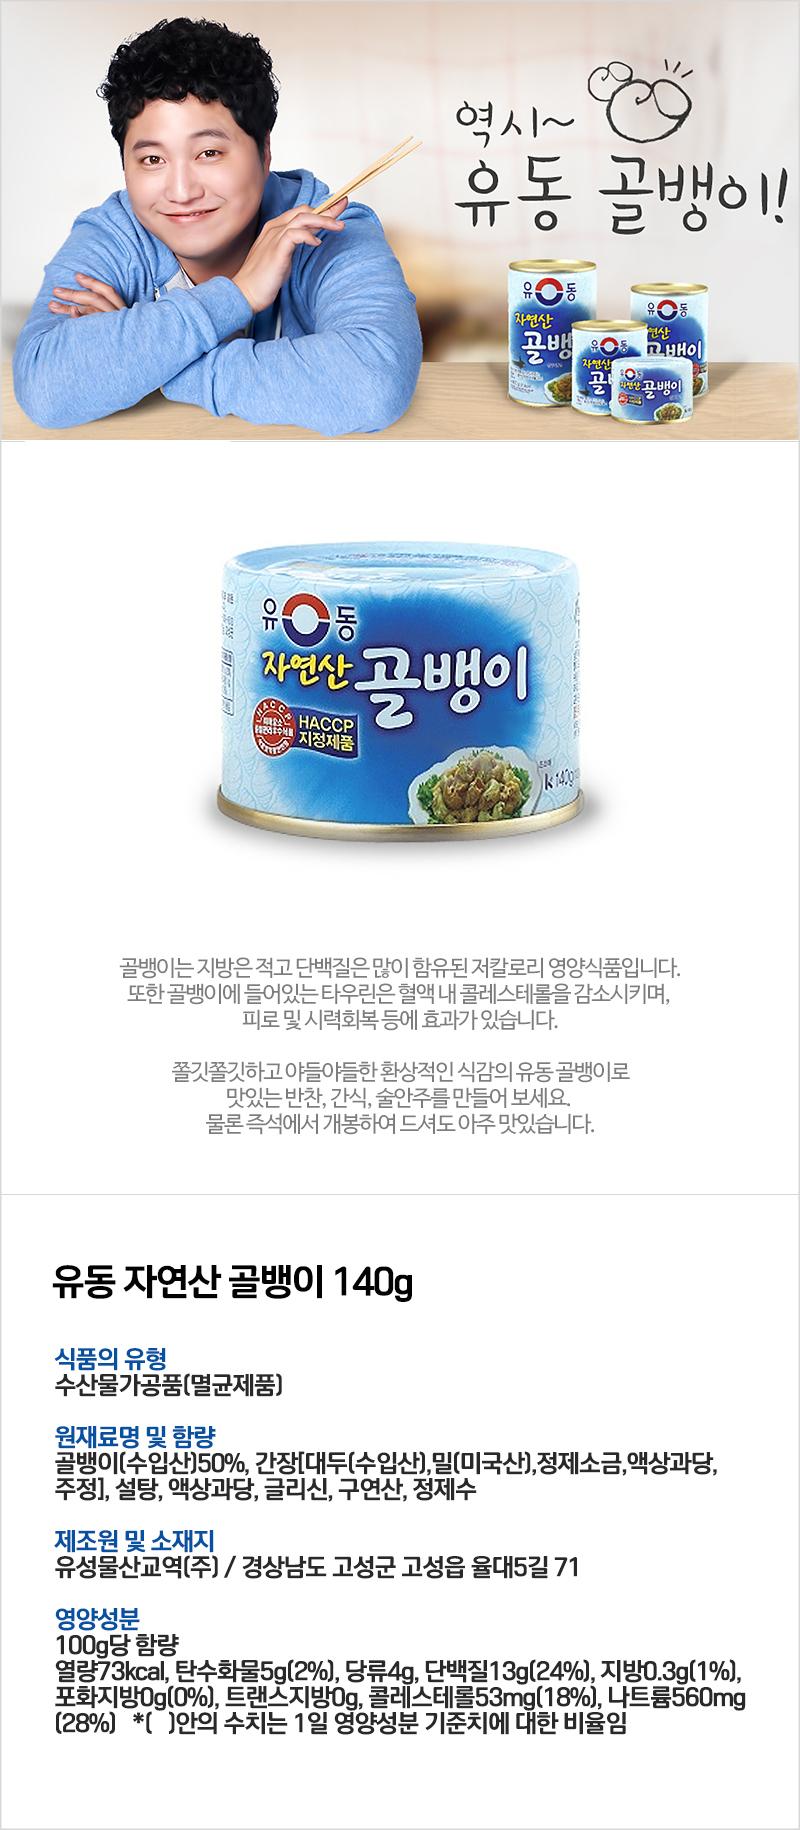 [ Yoodong ] Yoodong Whelk 140G X 2